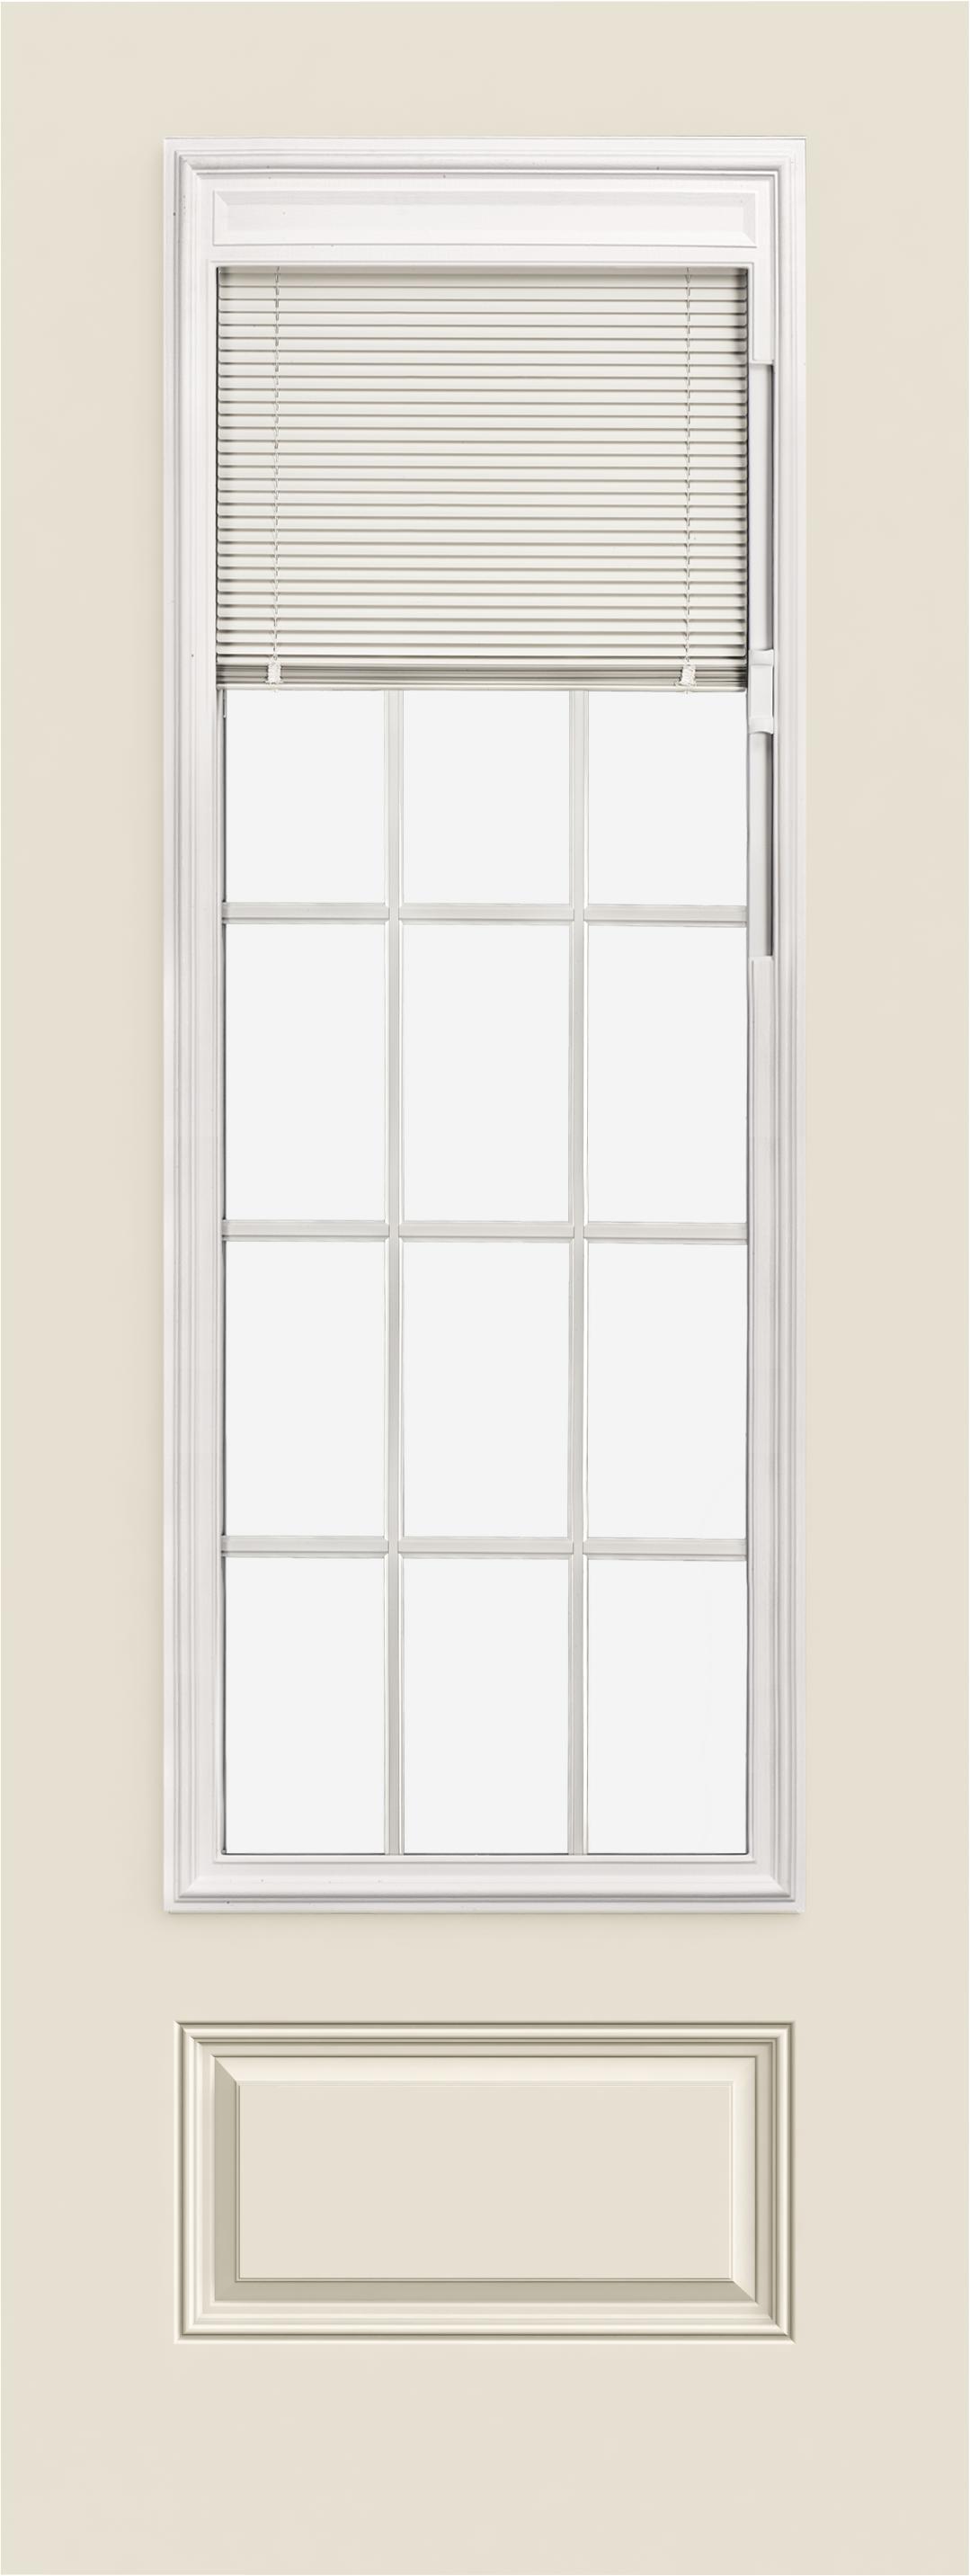 Smooth Pro Fiberglass Exterior Doors 8ft 3 4 View Blinds 15 Light 1 Panel Reliable And Energy Efficient Doors And Windows Jeld Wen Windows Doors